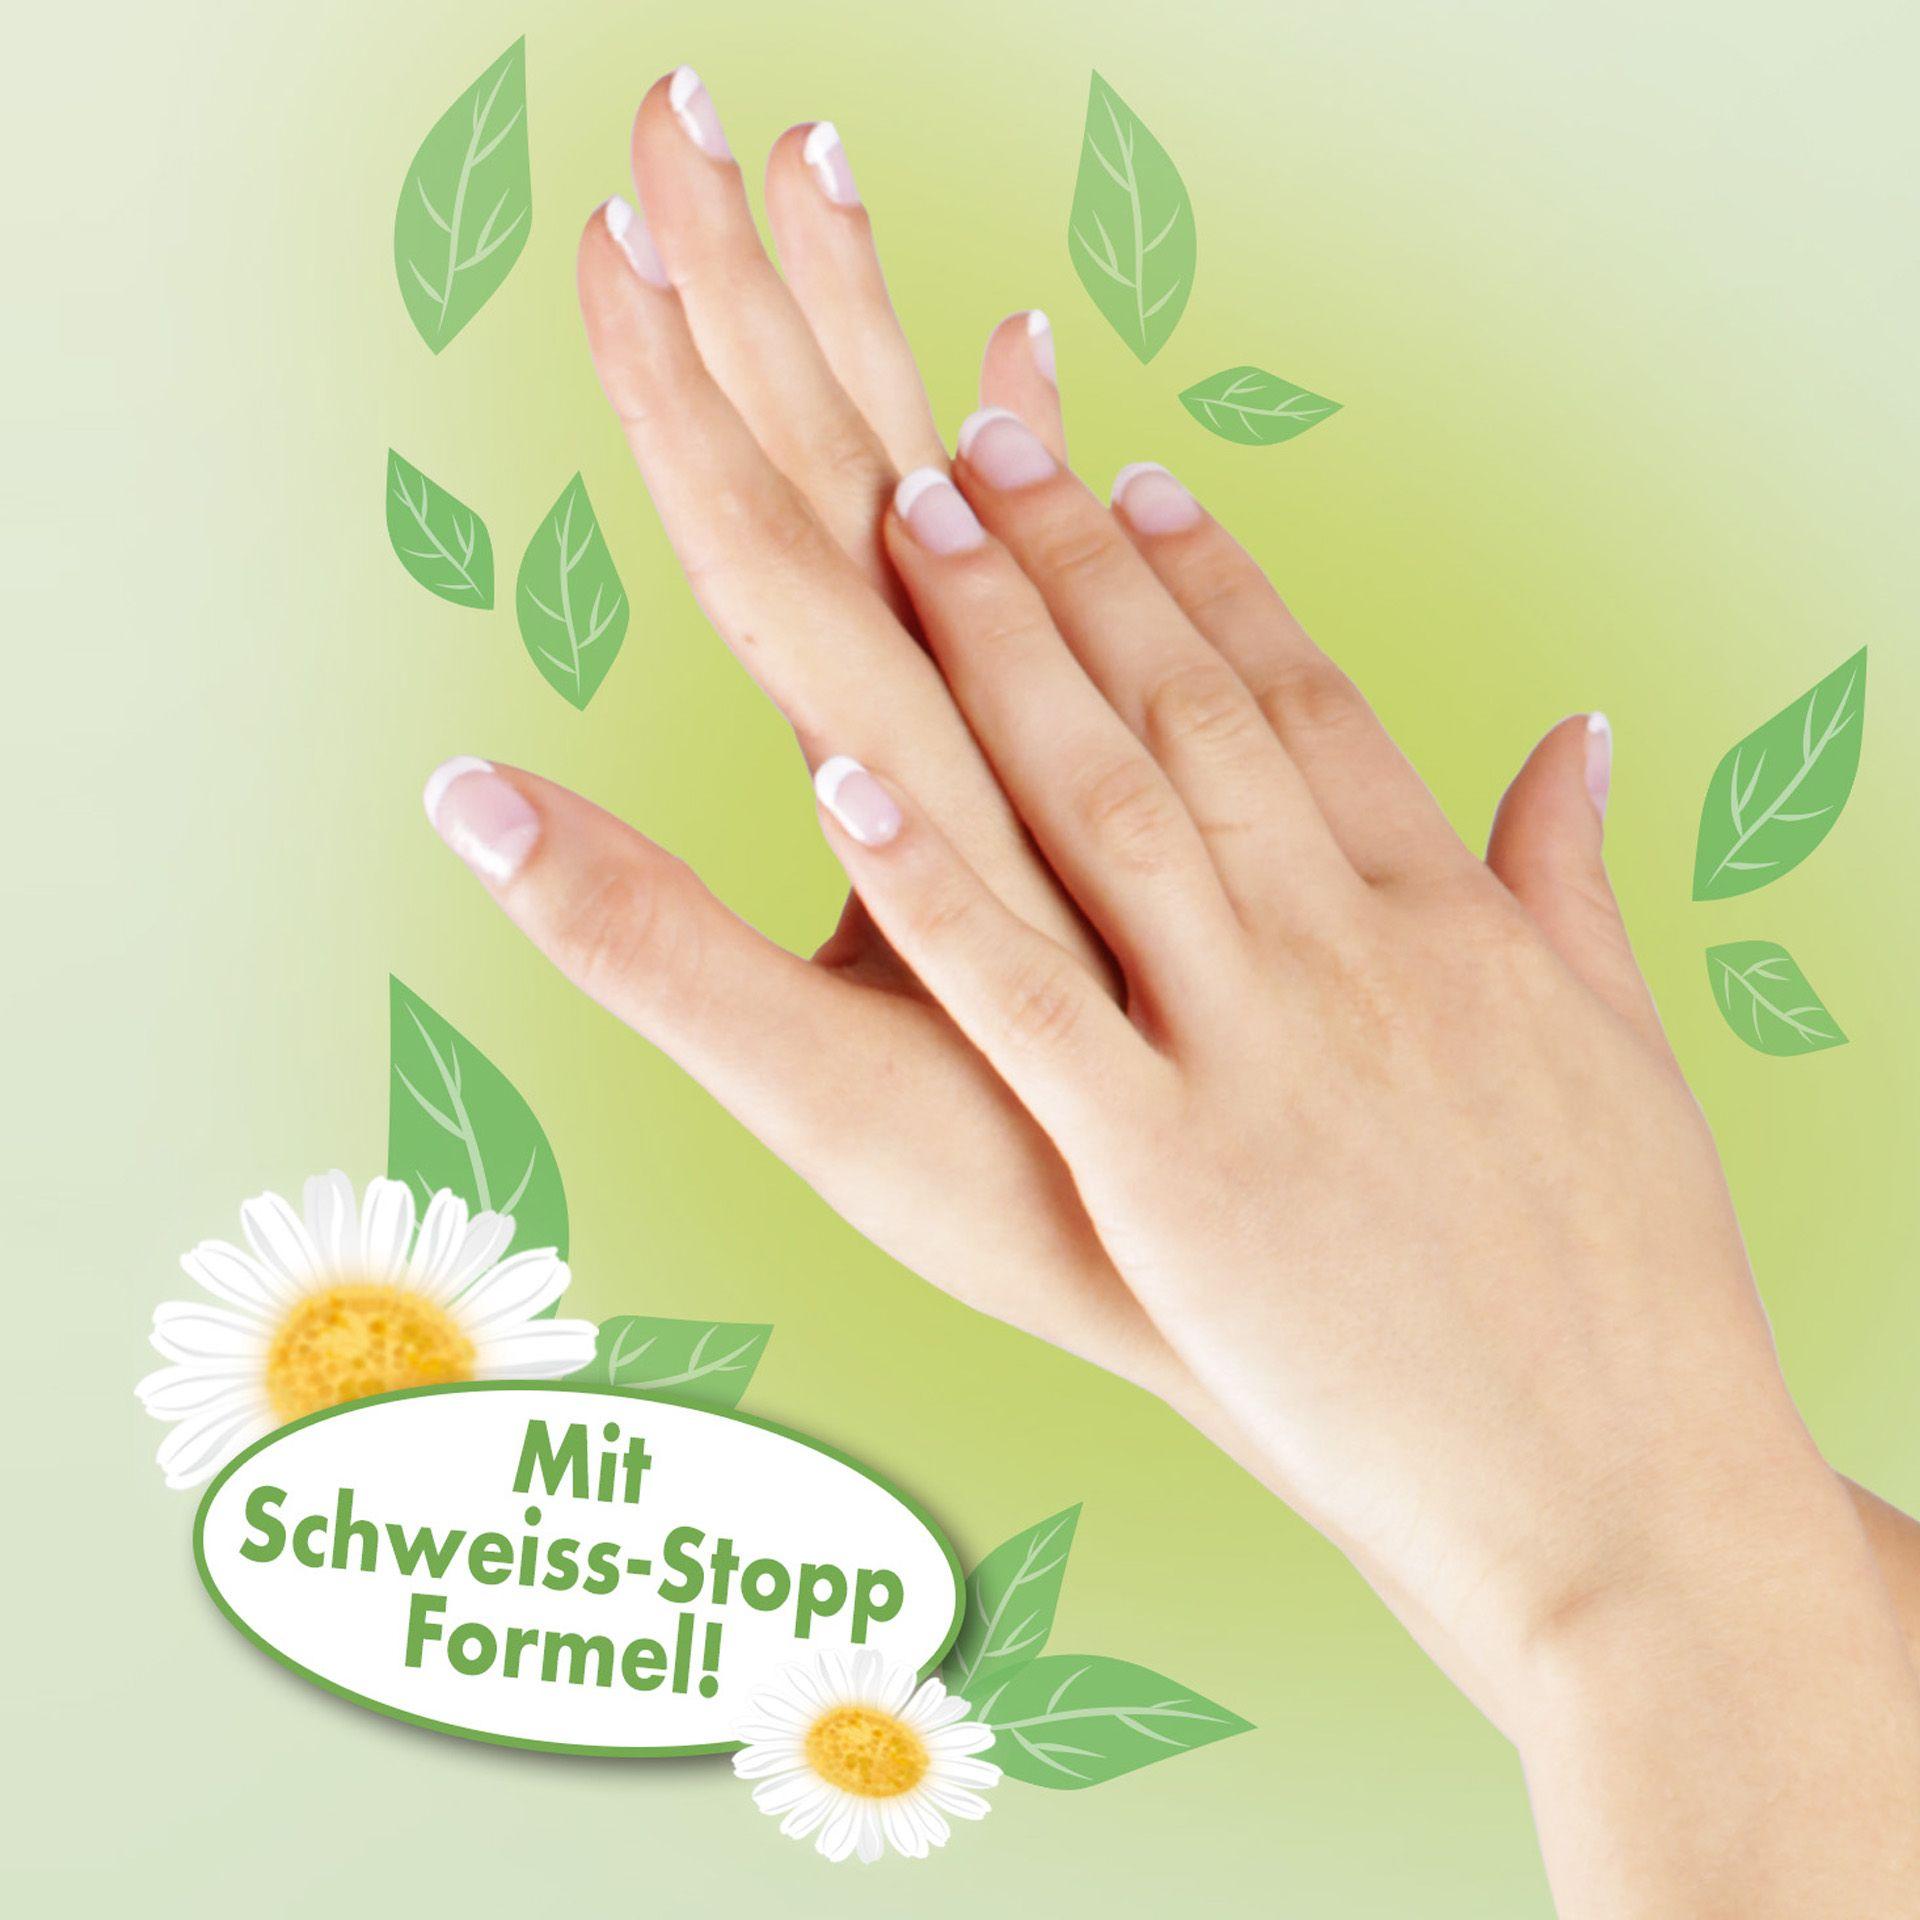 Vital Comfort Trocken Spray gegen schwitzige Hände, 100 ml